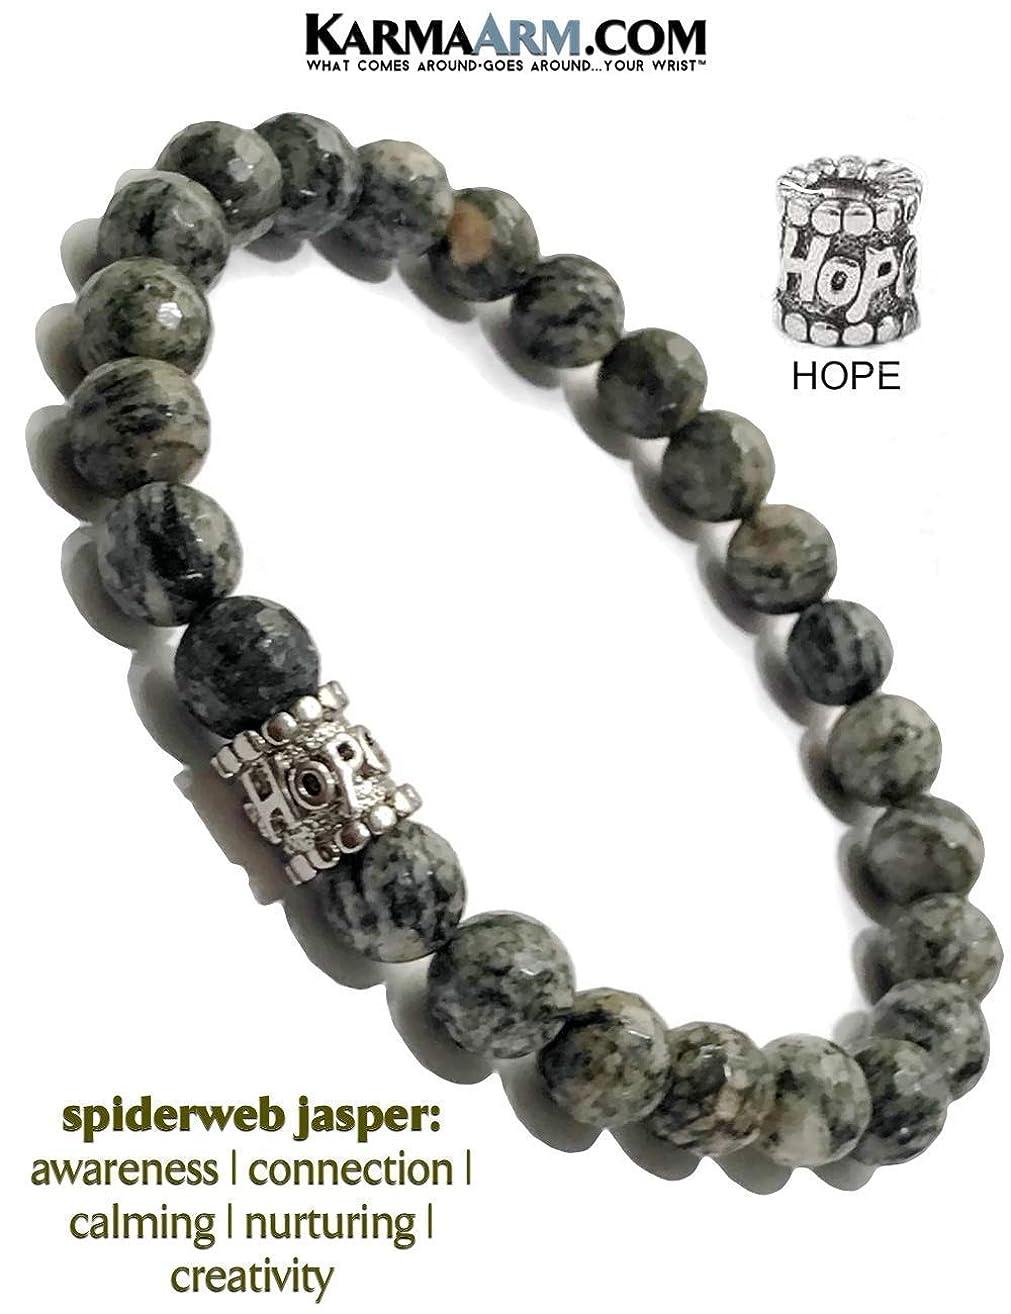 OPTIMISM: Spiderweb Jasper   HOPE Bead Bracelet   Mantra Bracelet Reiki Healing Meditation Jewelry